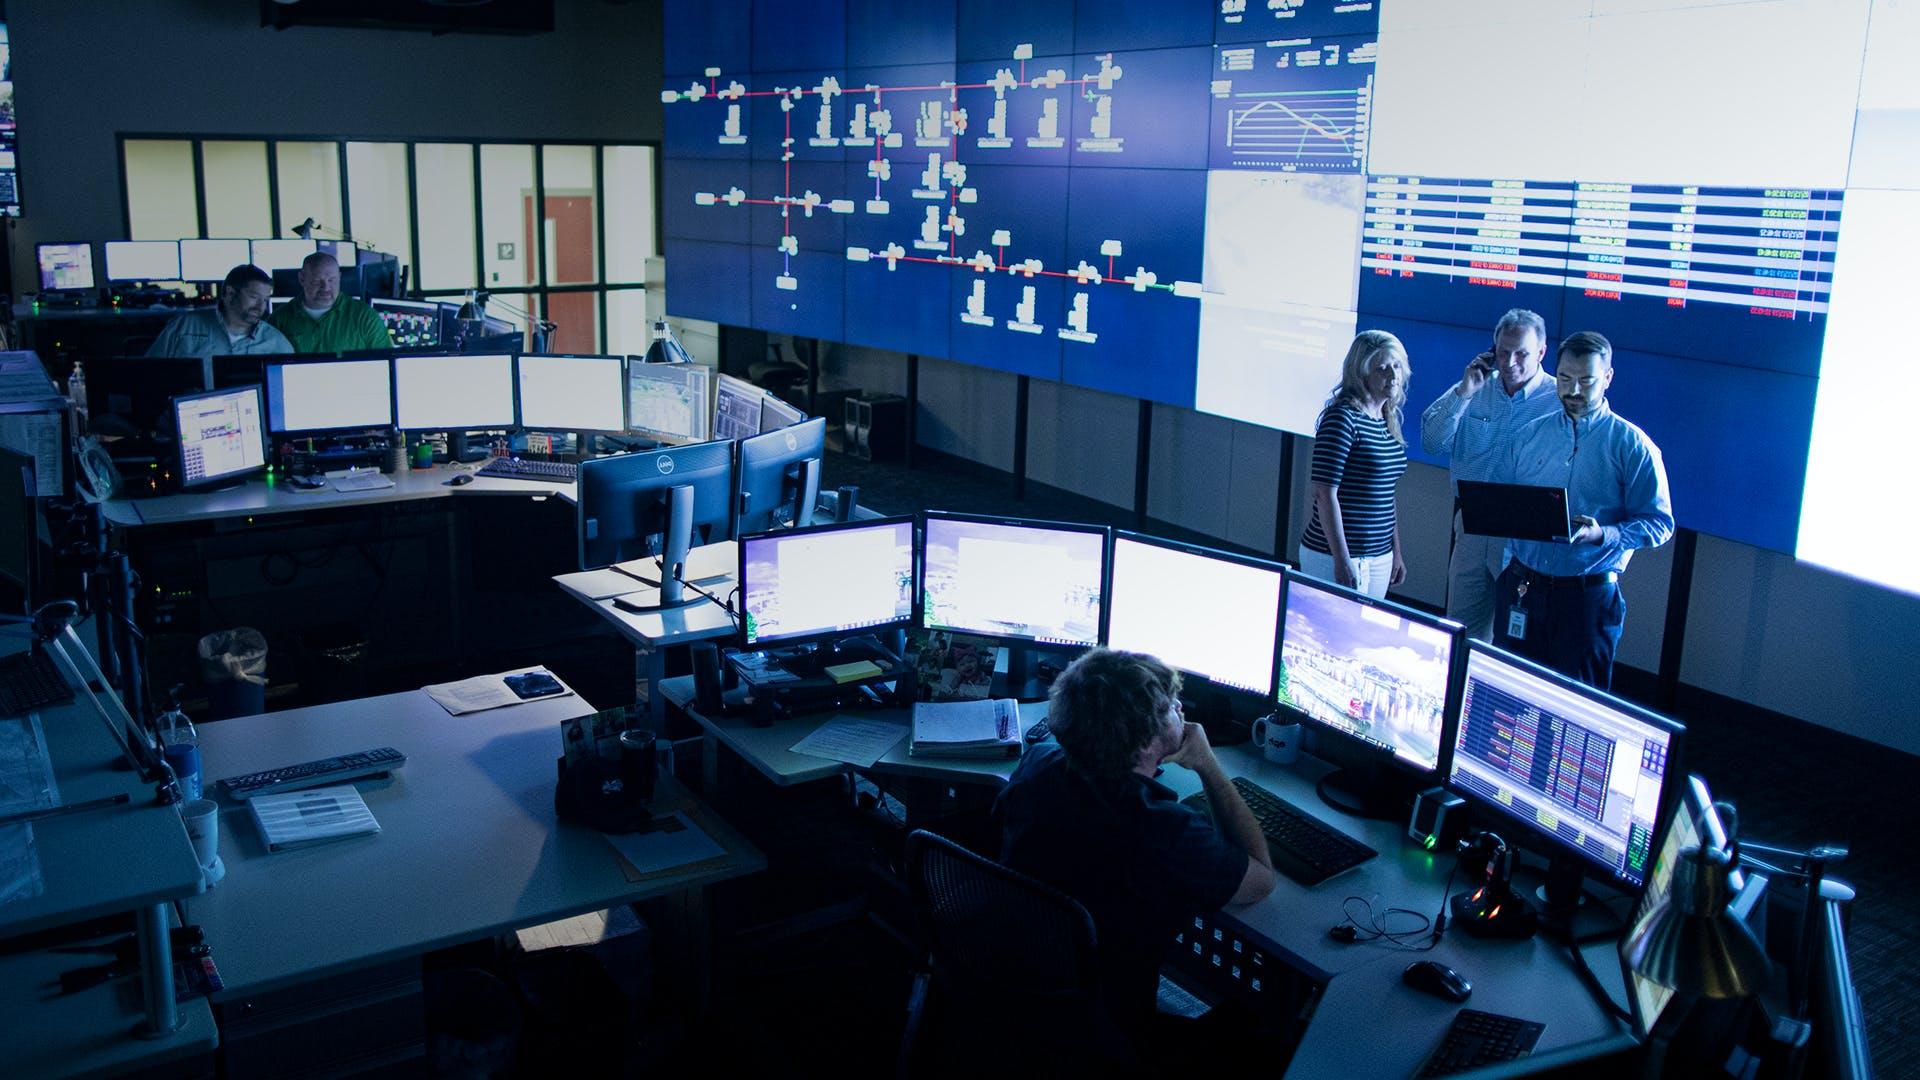 control-room-business-lp.jpg